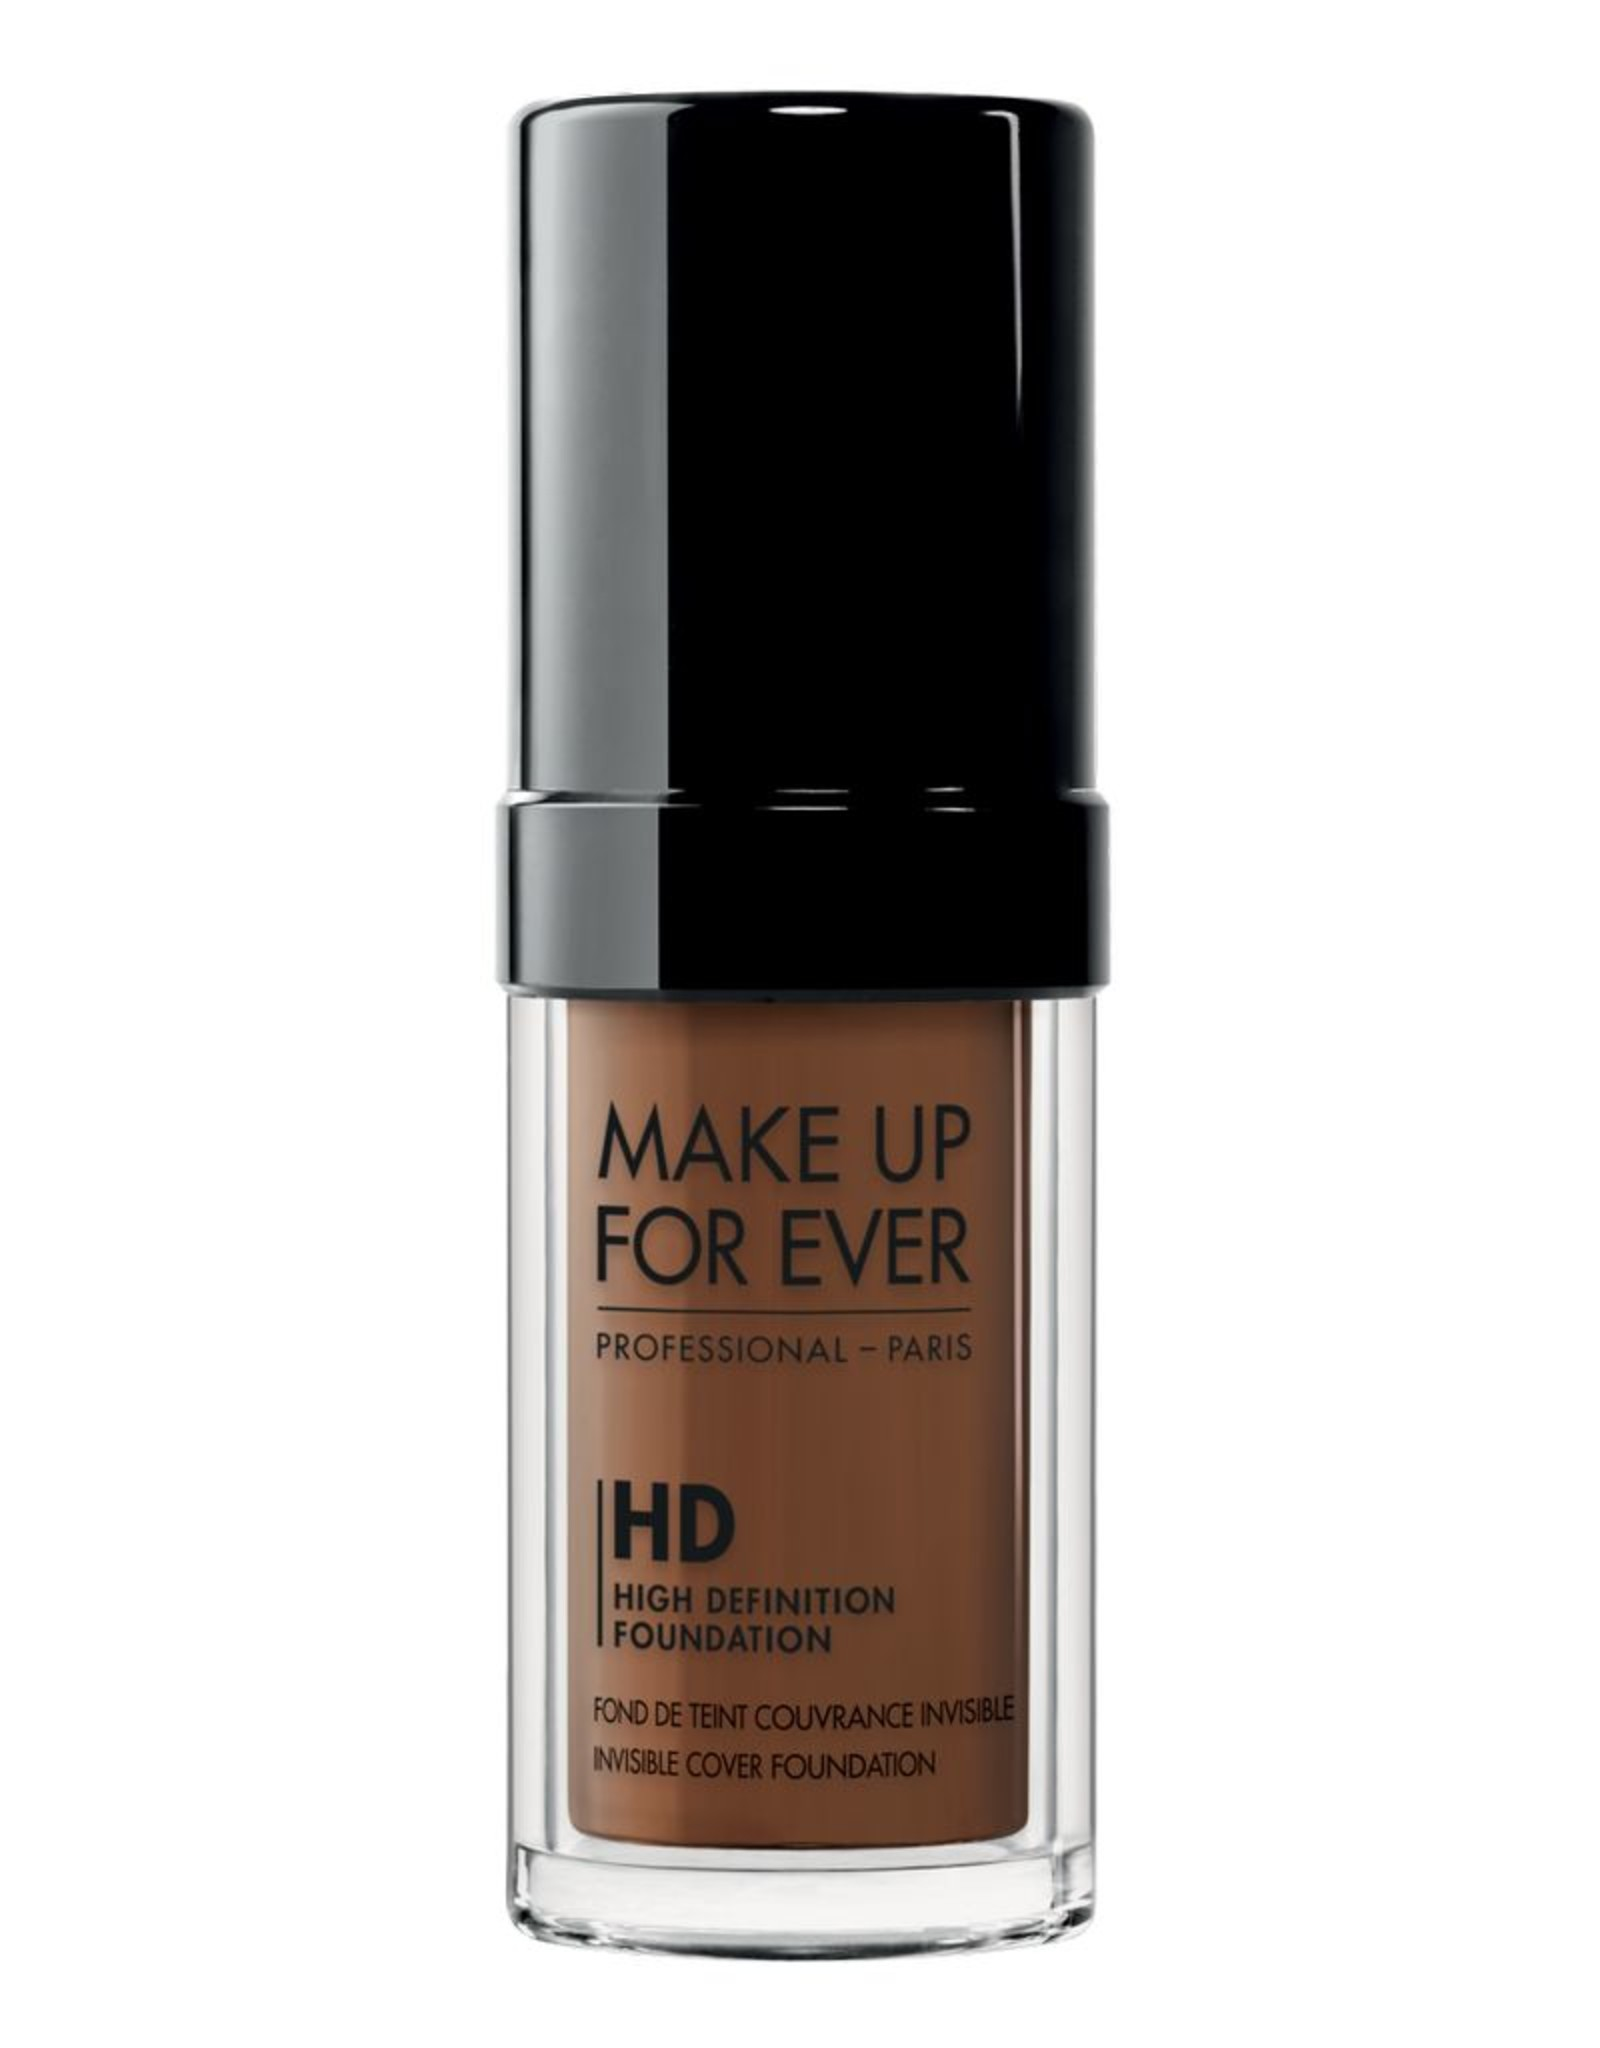 MUFE FOND DE TEINT HD 30ML (invisible) N180 brun / brown